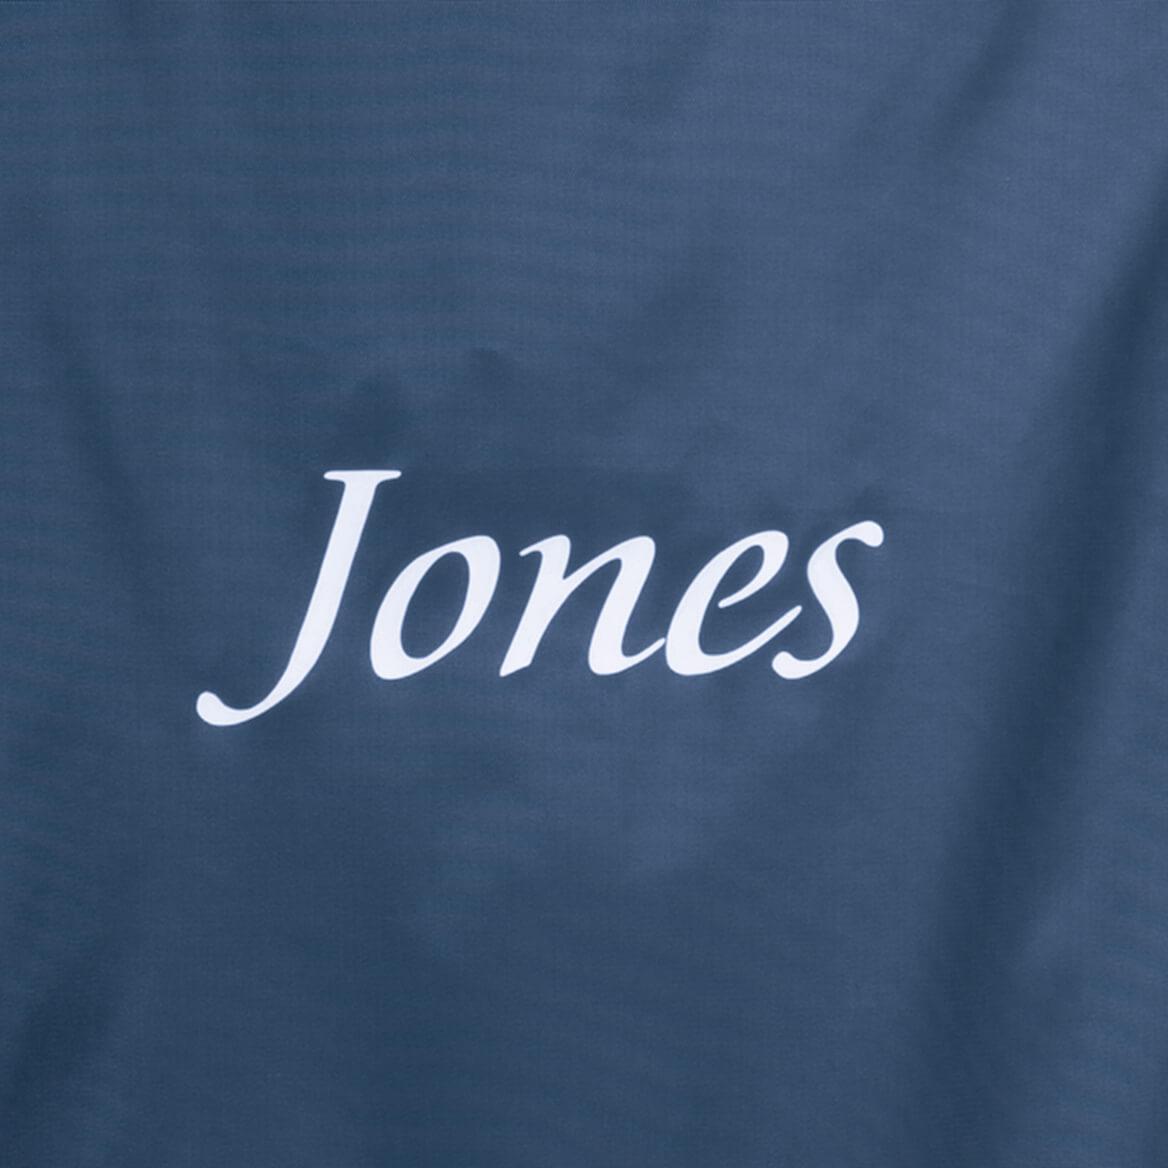 Personalized Nylon Dress Bag-303267